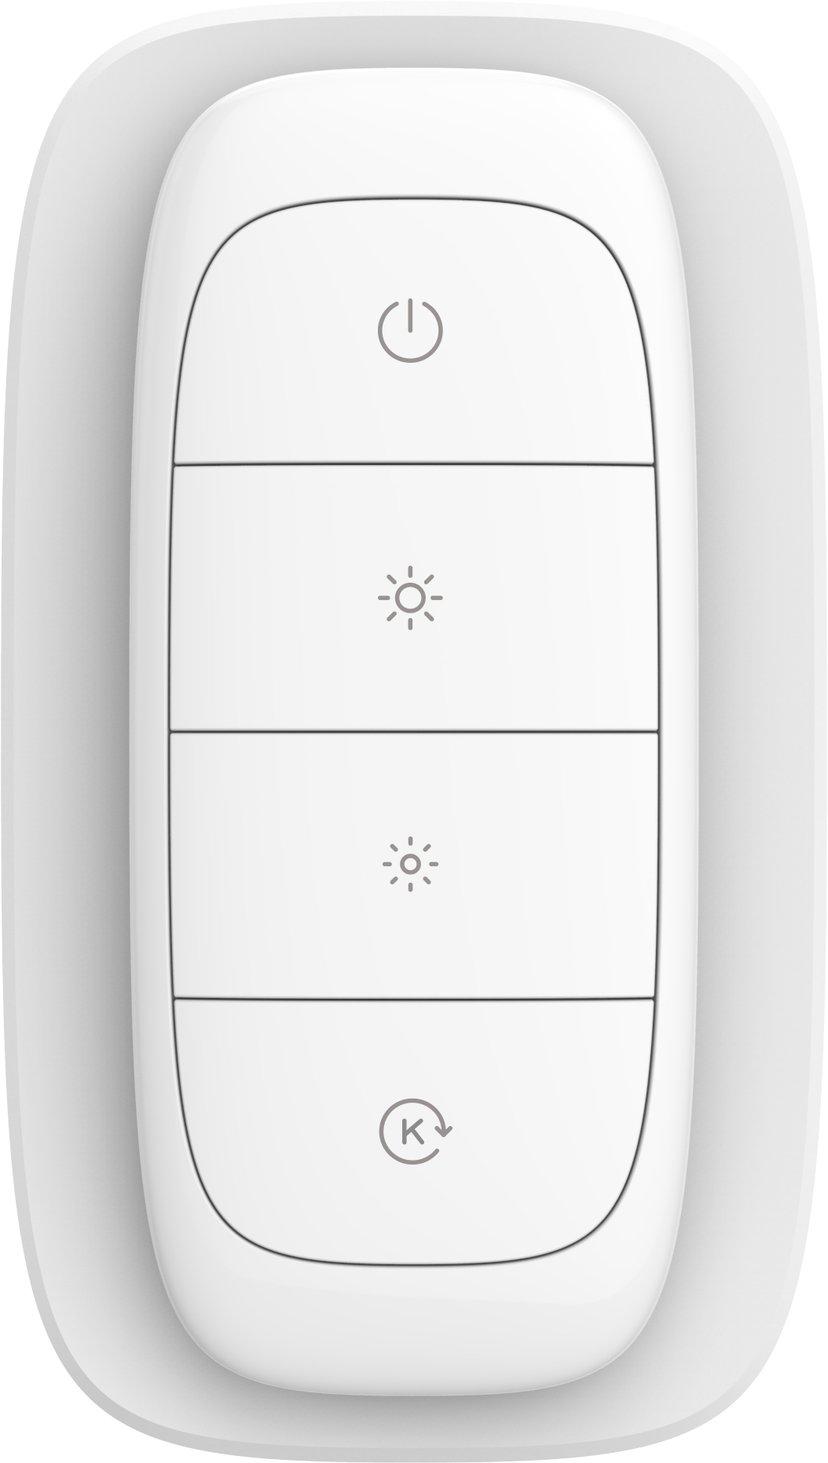 Smartline Flow Remote Control 4-Key